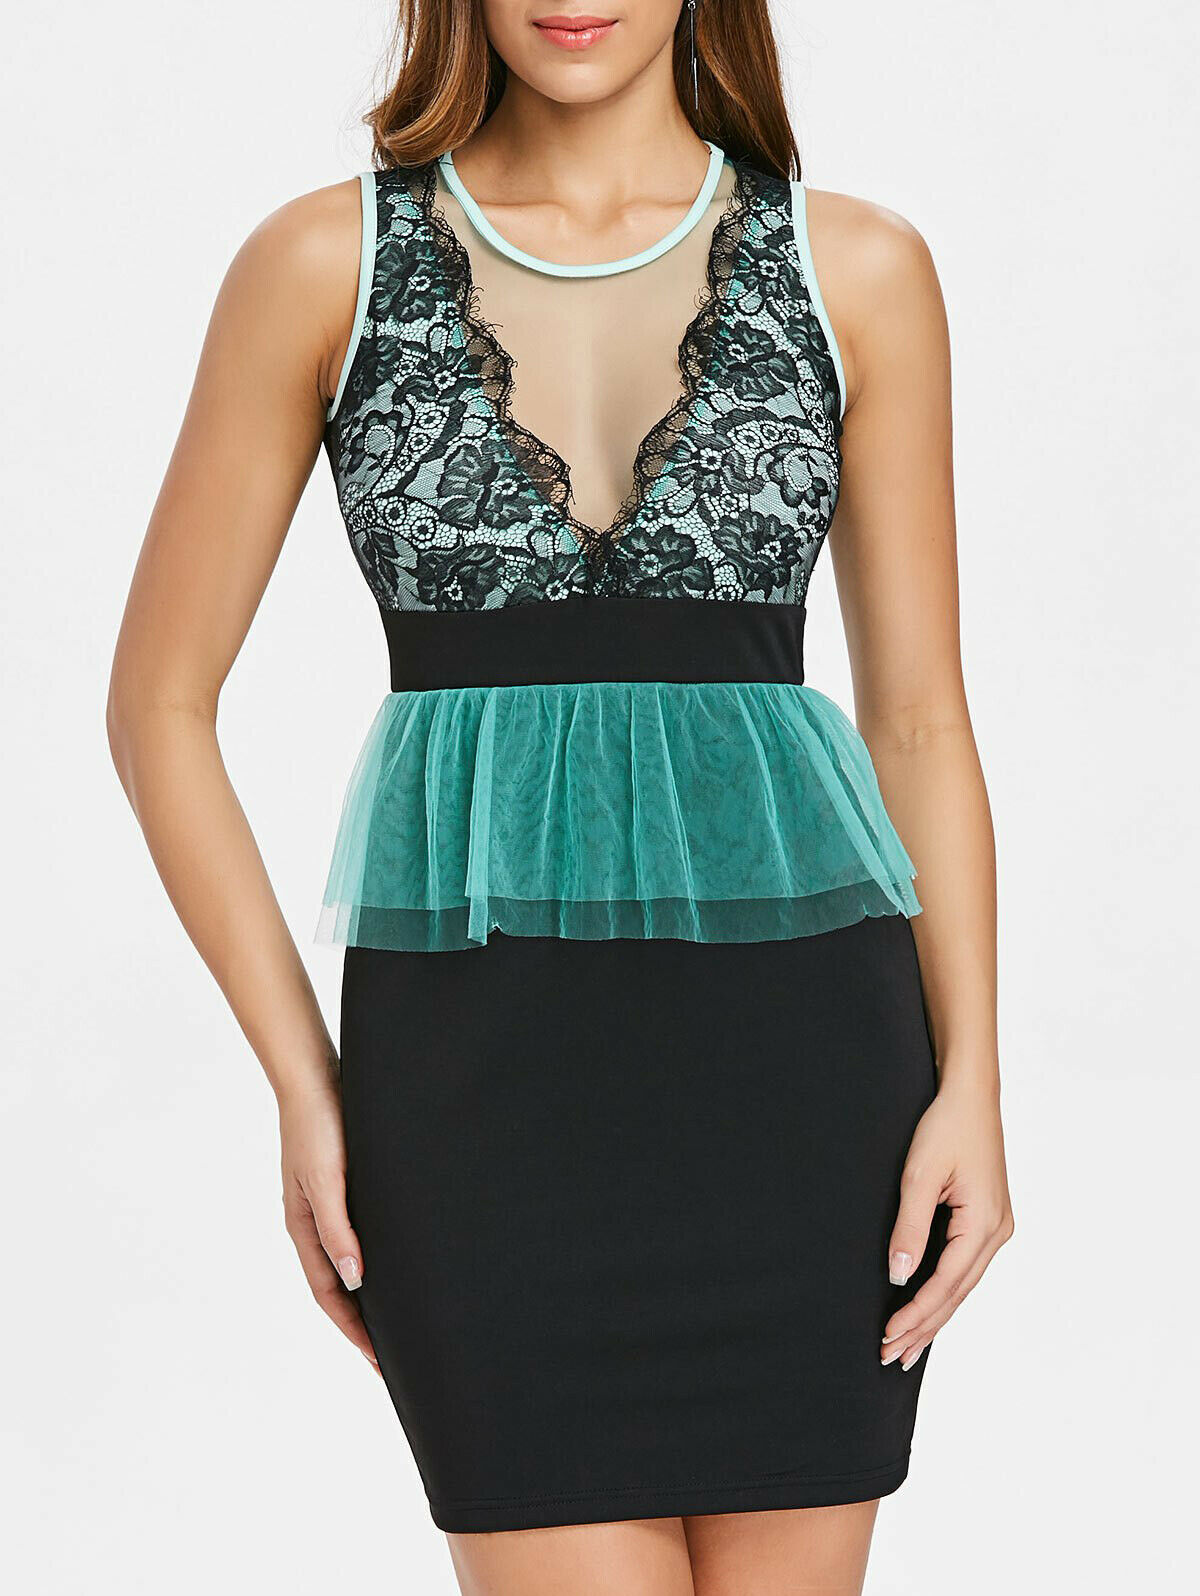 Black and Aqua Peplum Bodycon Dress size S, L and XL